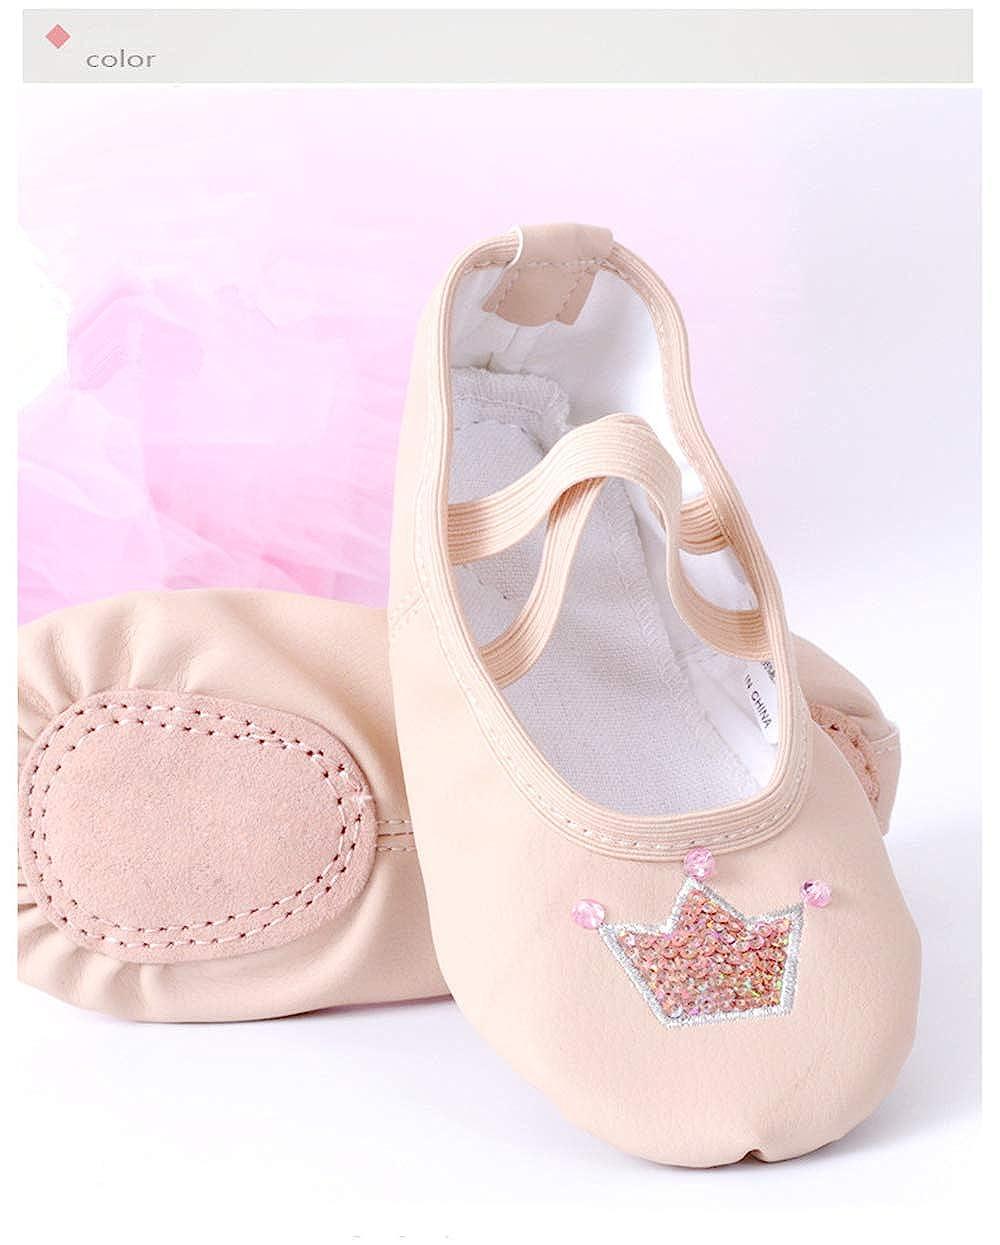 Apricot-EU 23//6 M US Toddler YSNJL Toddlers Lucky Ballet Flat